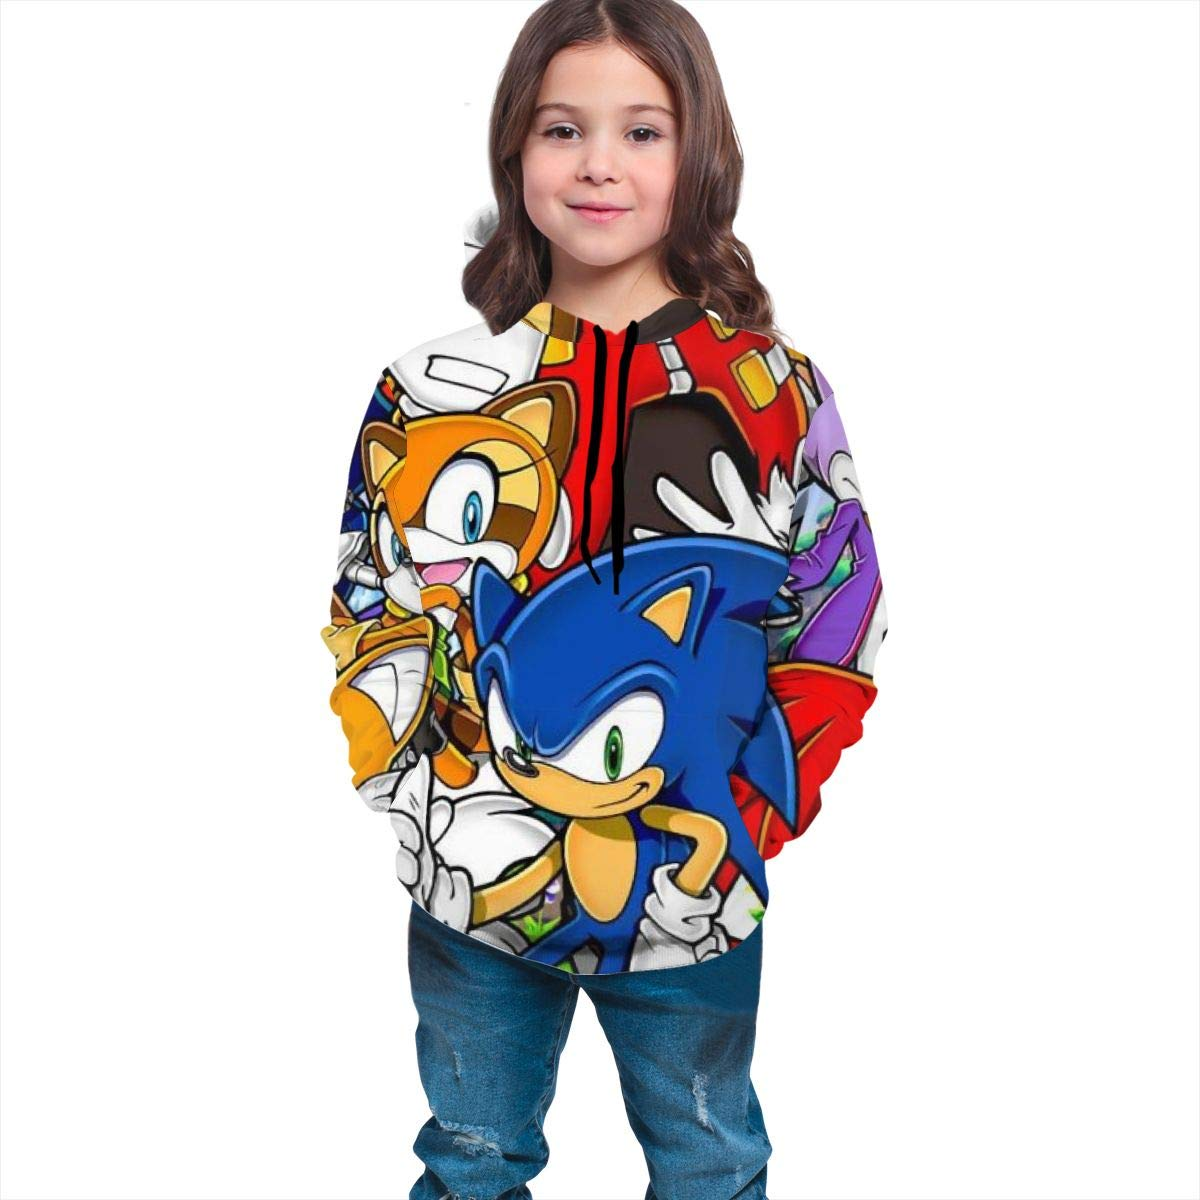 Childrens Hoodies Sonic-The Hedg-Ehog 3D Print Unisex Pullover Hooded Sweatshirts for Boys//Girls//Teen//Kids